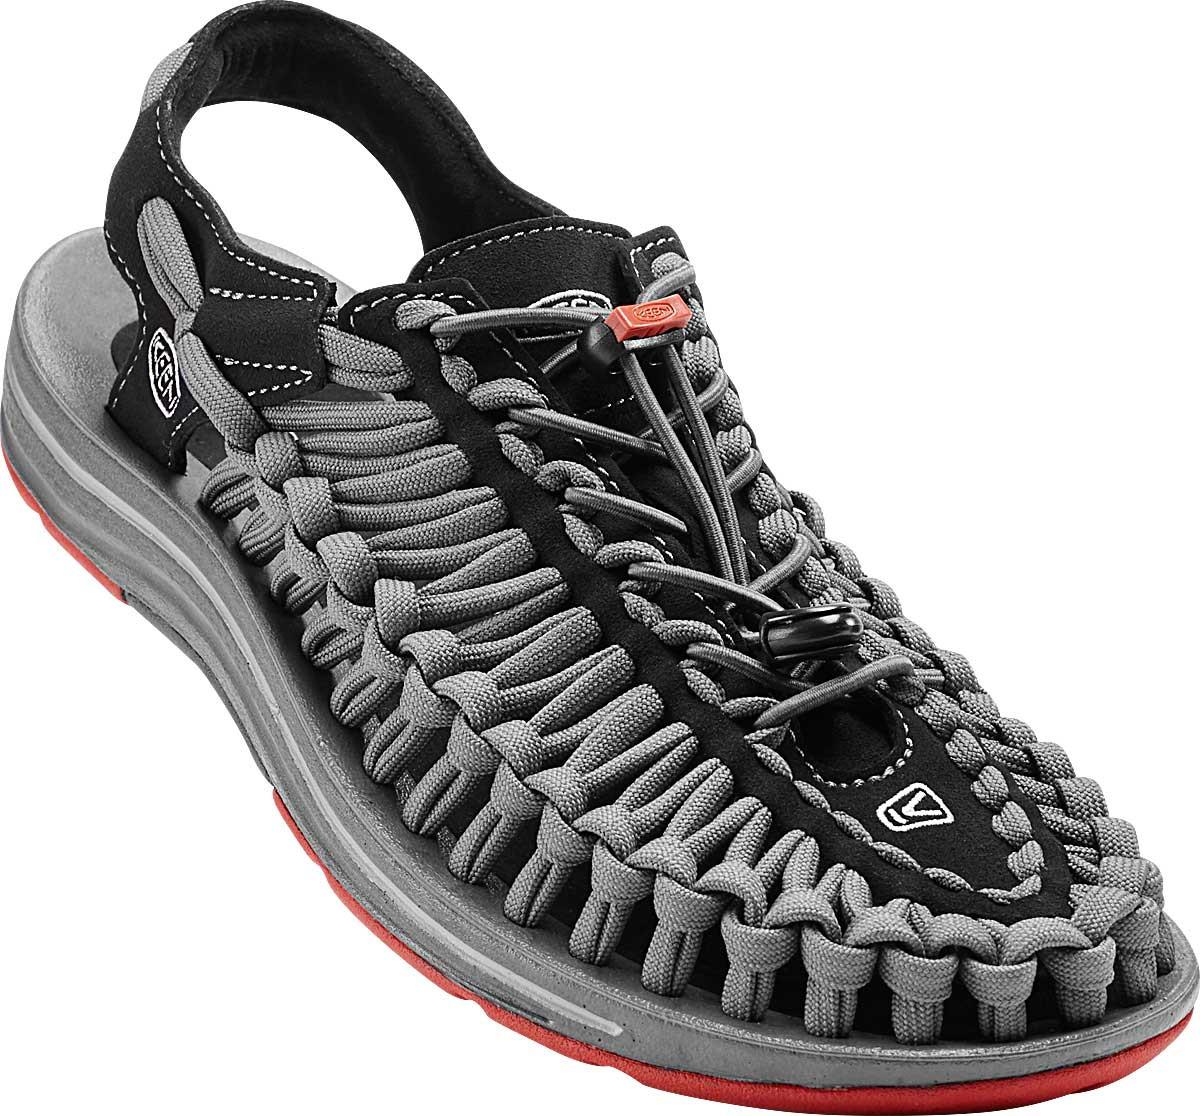 350e22ea8116 ... Shop By Style · Sandals  Keen Men s Uneek Flat Cord. Black Bossa Nova